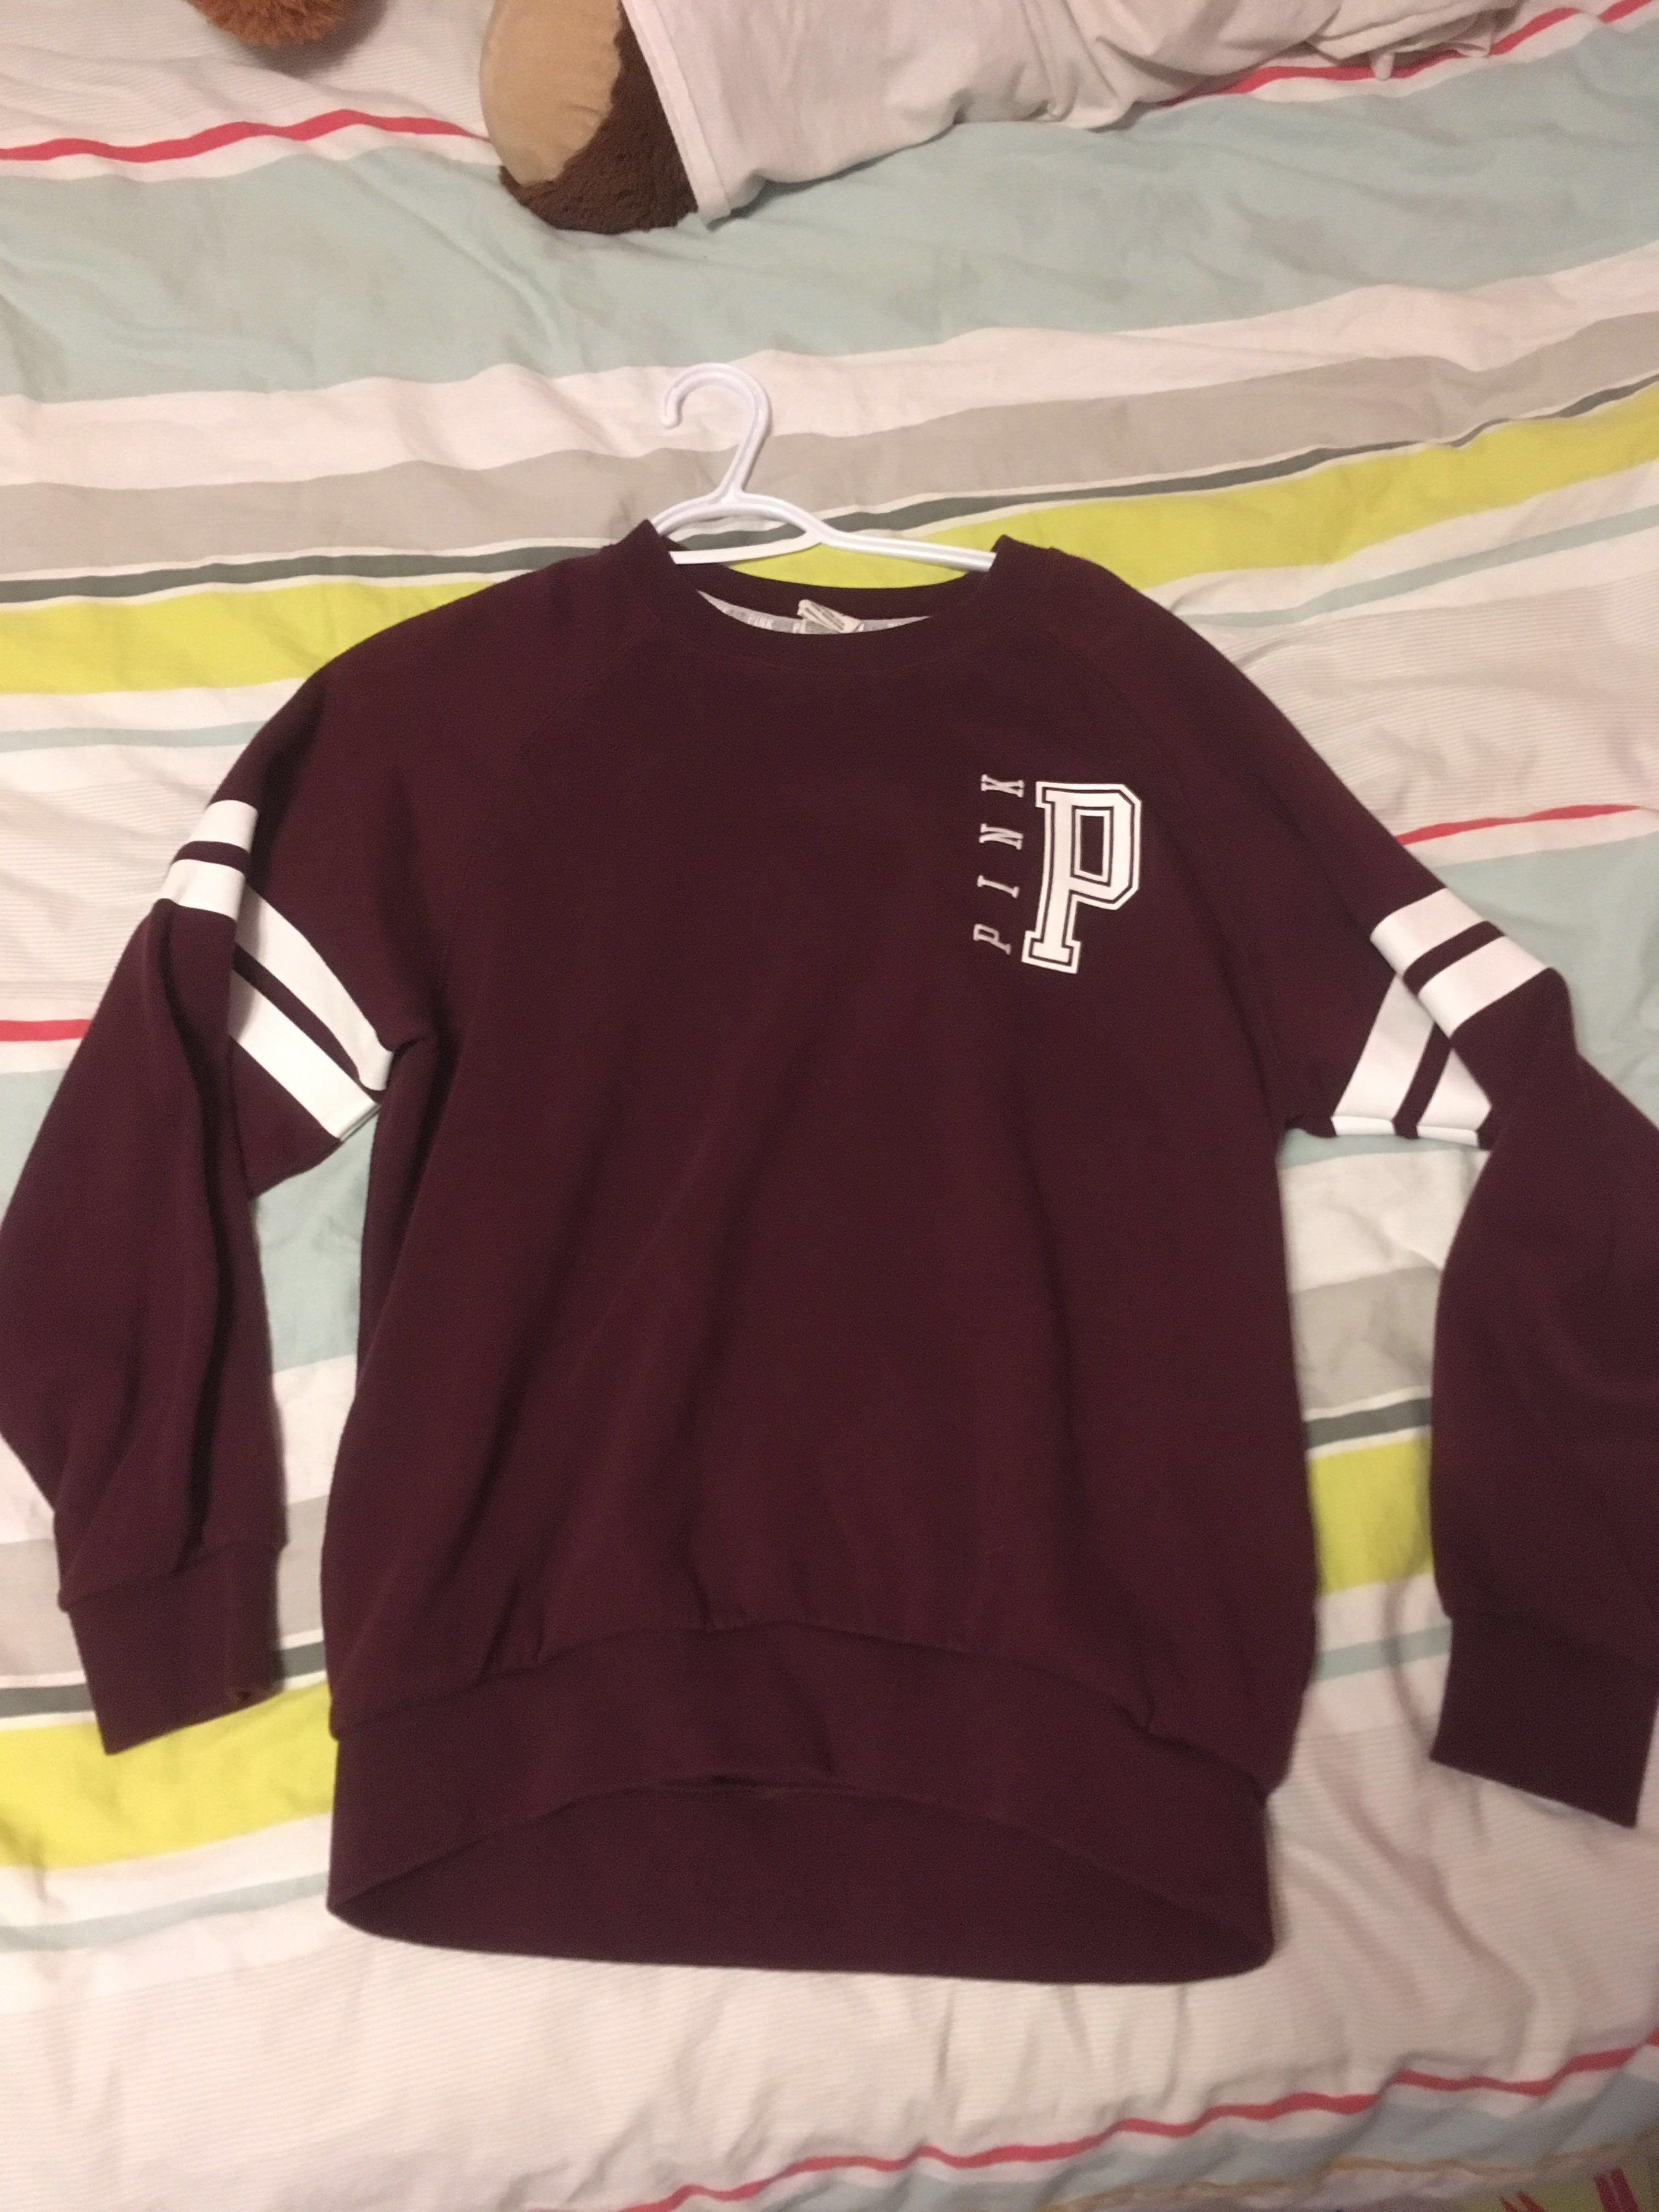 XS Pink burgundy sweatshirt